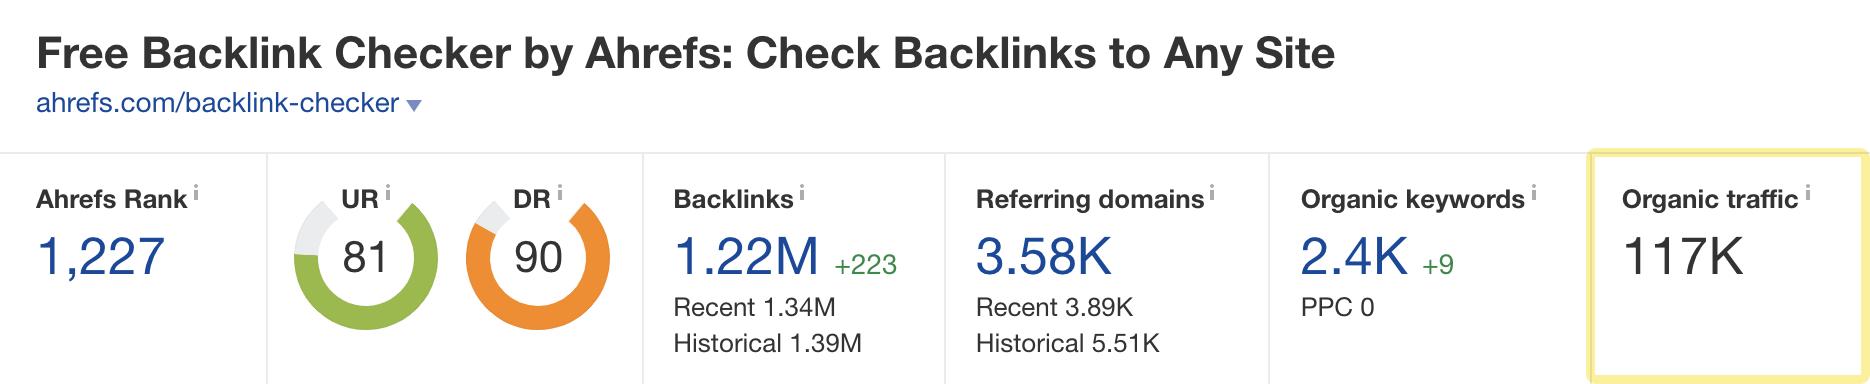 16 ahrefs free backlink checker estimated organic traffic site